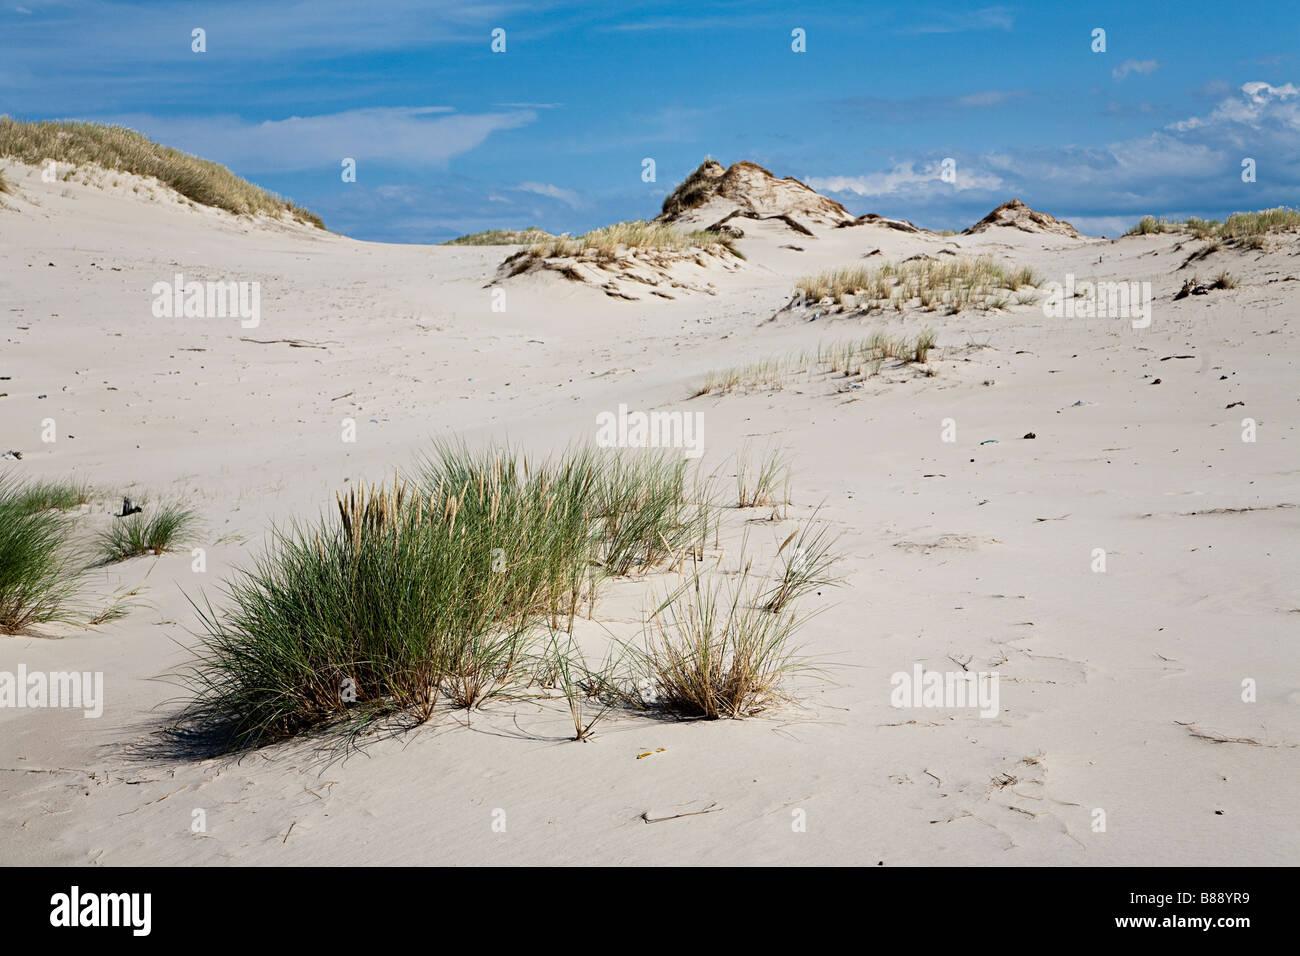 Area of blown out eroded sand dunes with marram grass Lacka Gora dunes Slowinski national park Leba Poland - Stock Image